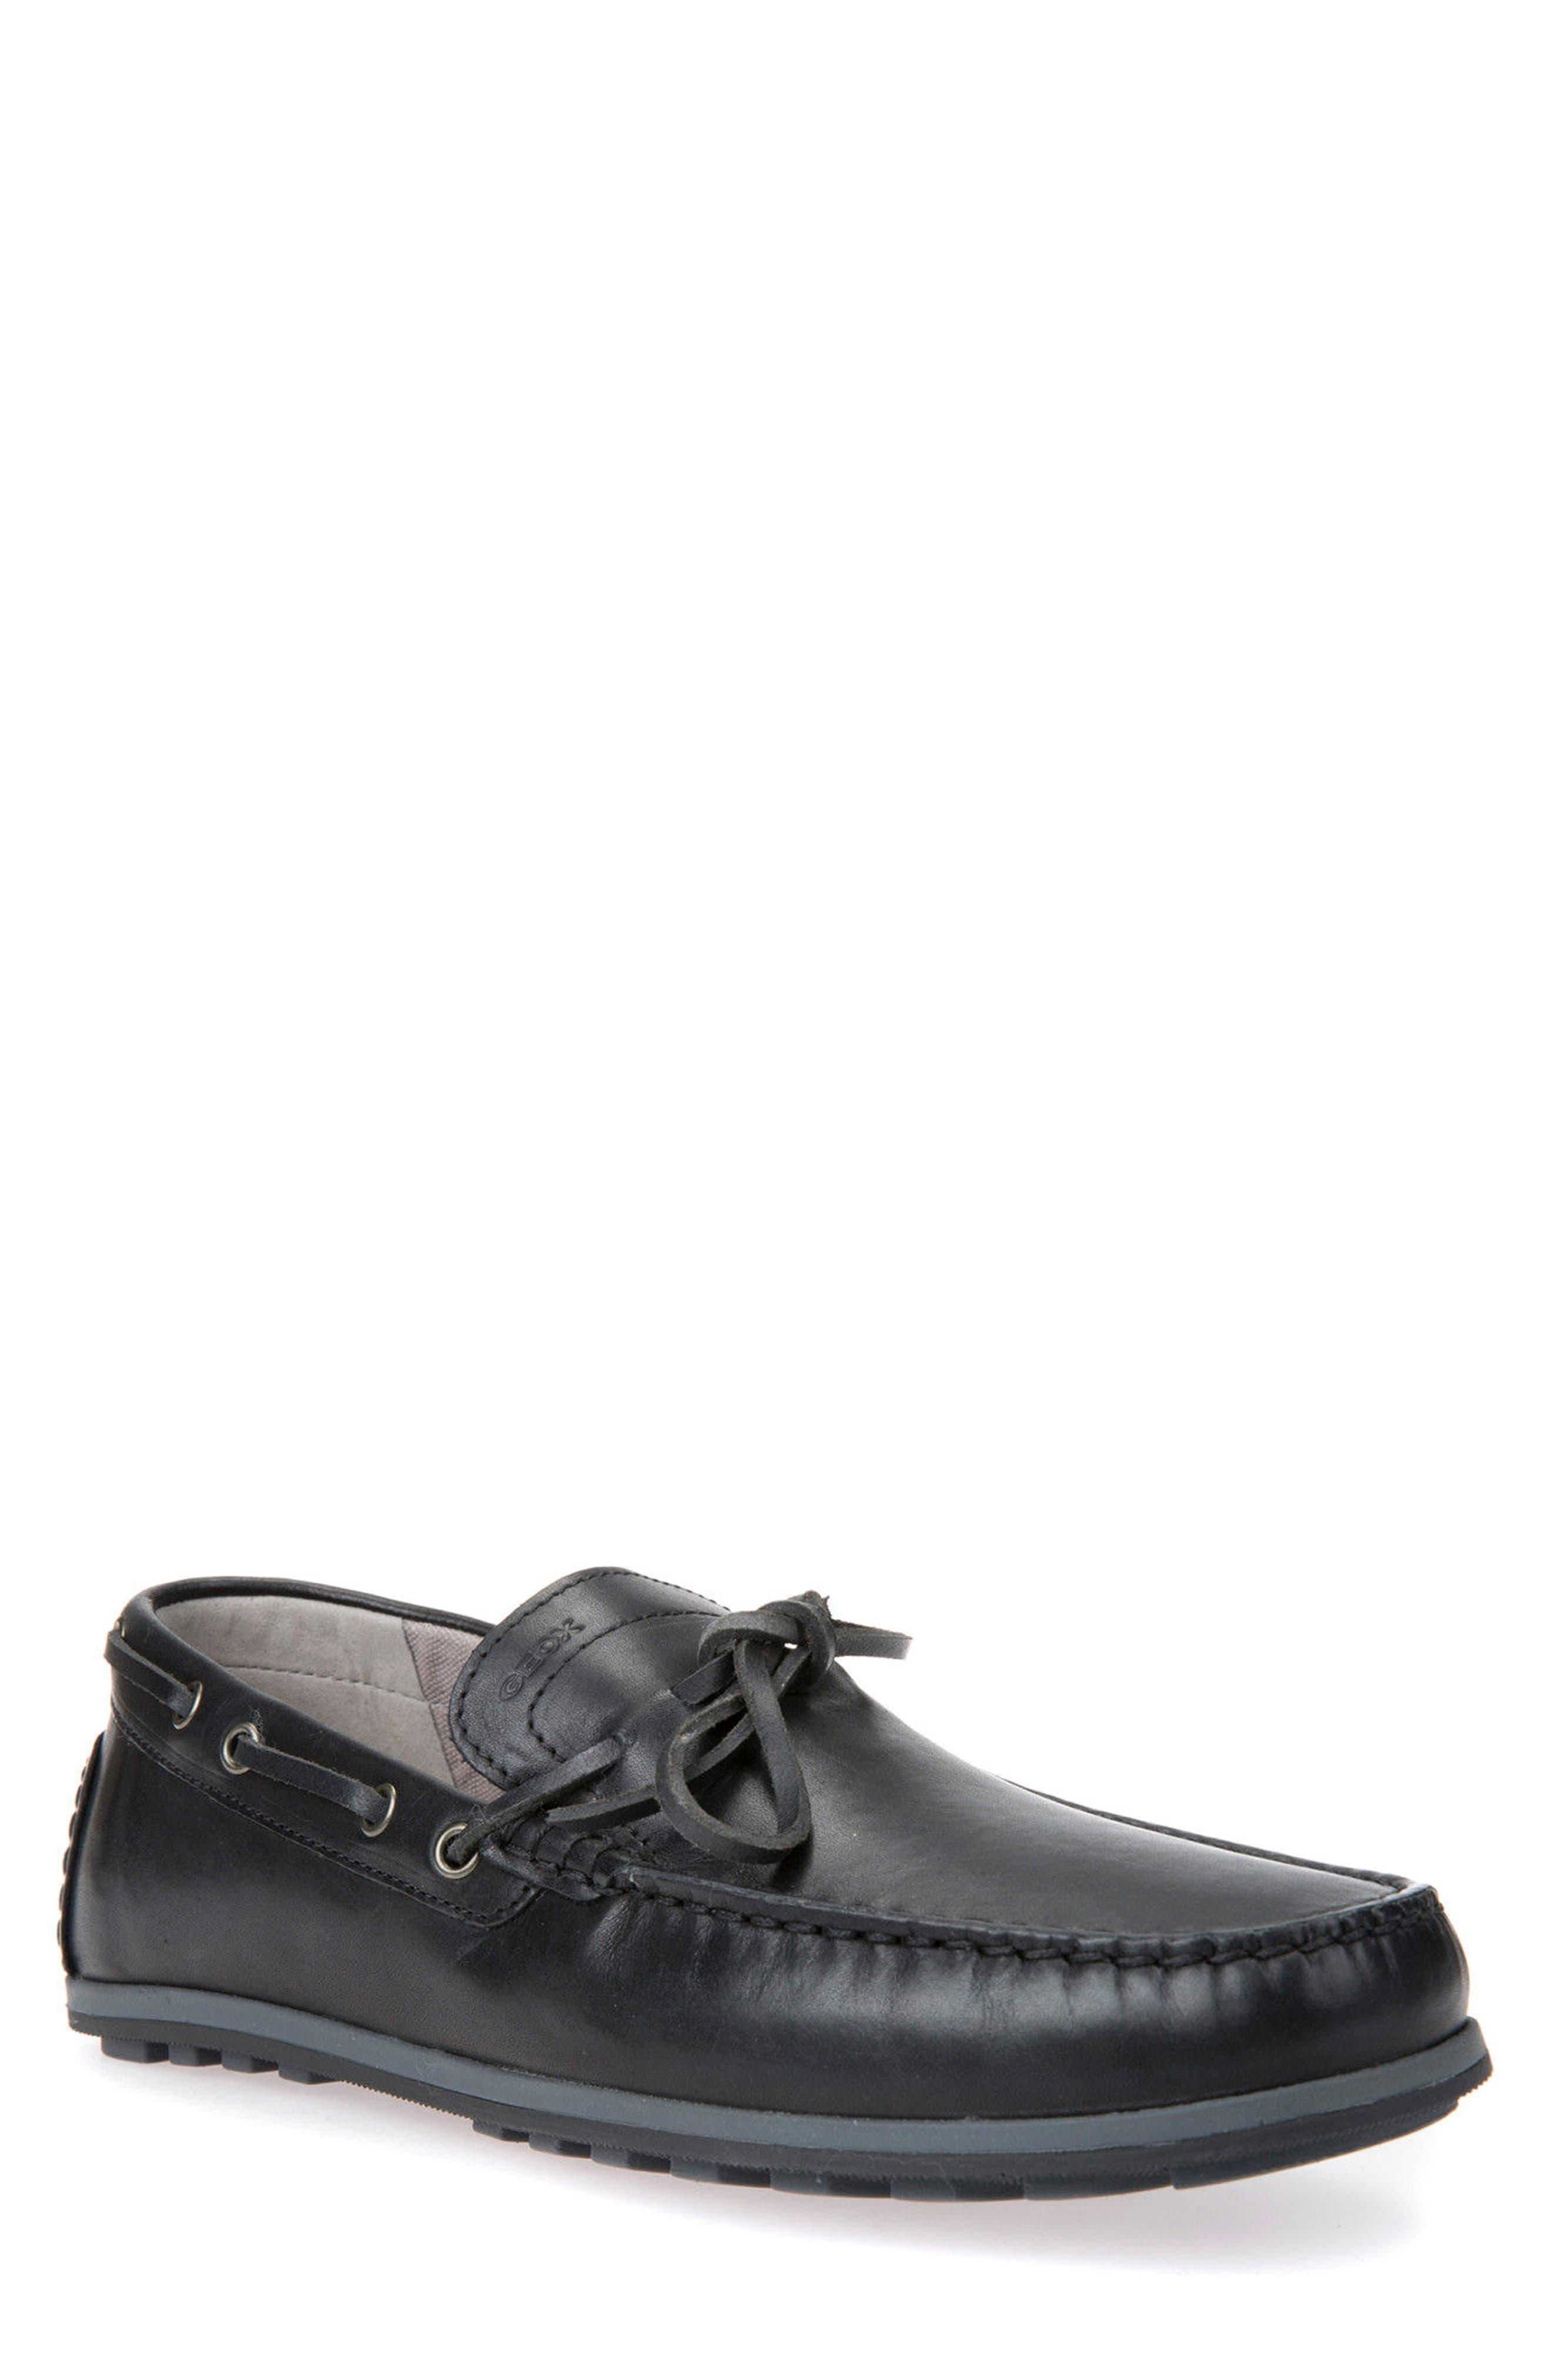 Mirvin 3 Boat Shoe,                         Main,                         color, 001